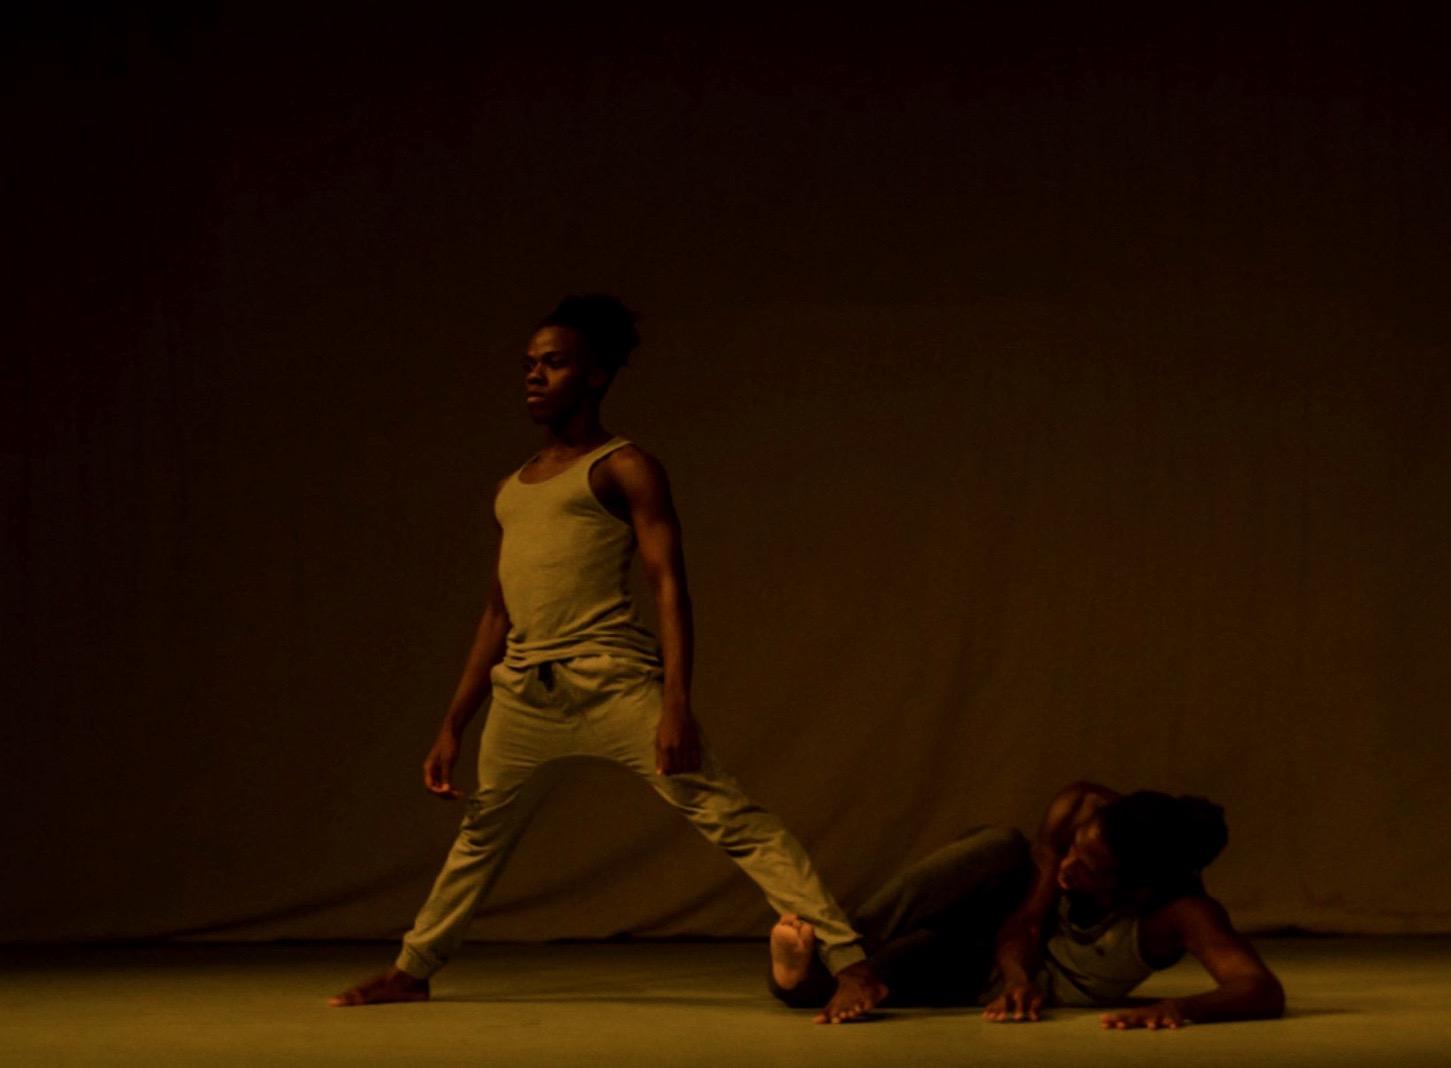 Slate - Choreographer: Jamal CallenderMusic: Nicholas BritellDancer: 3